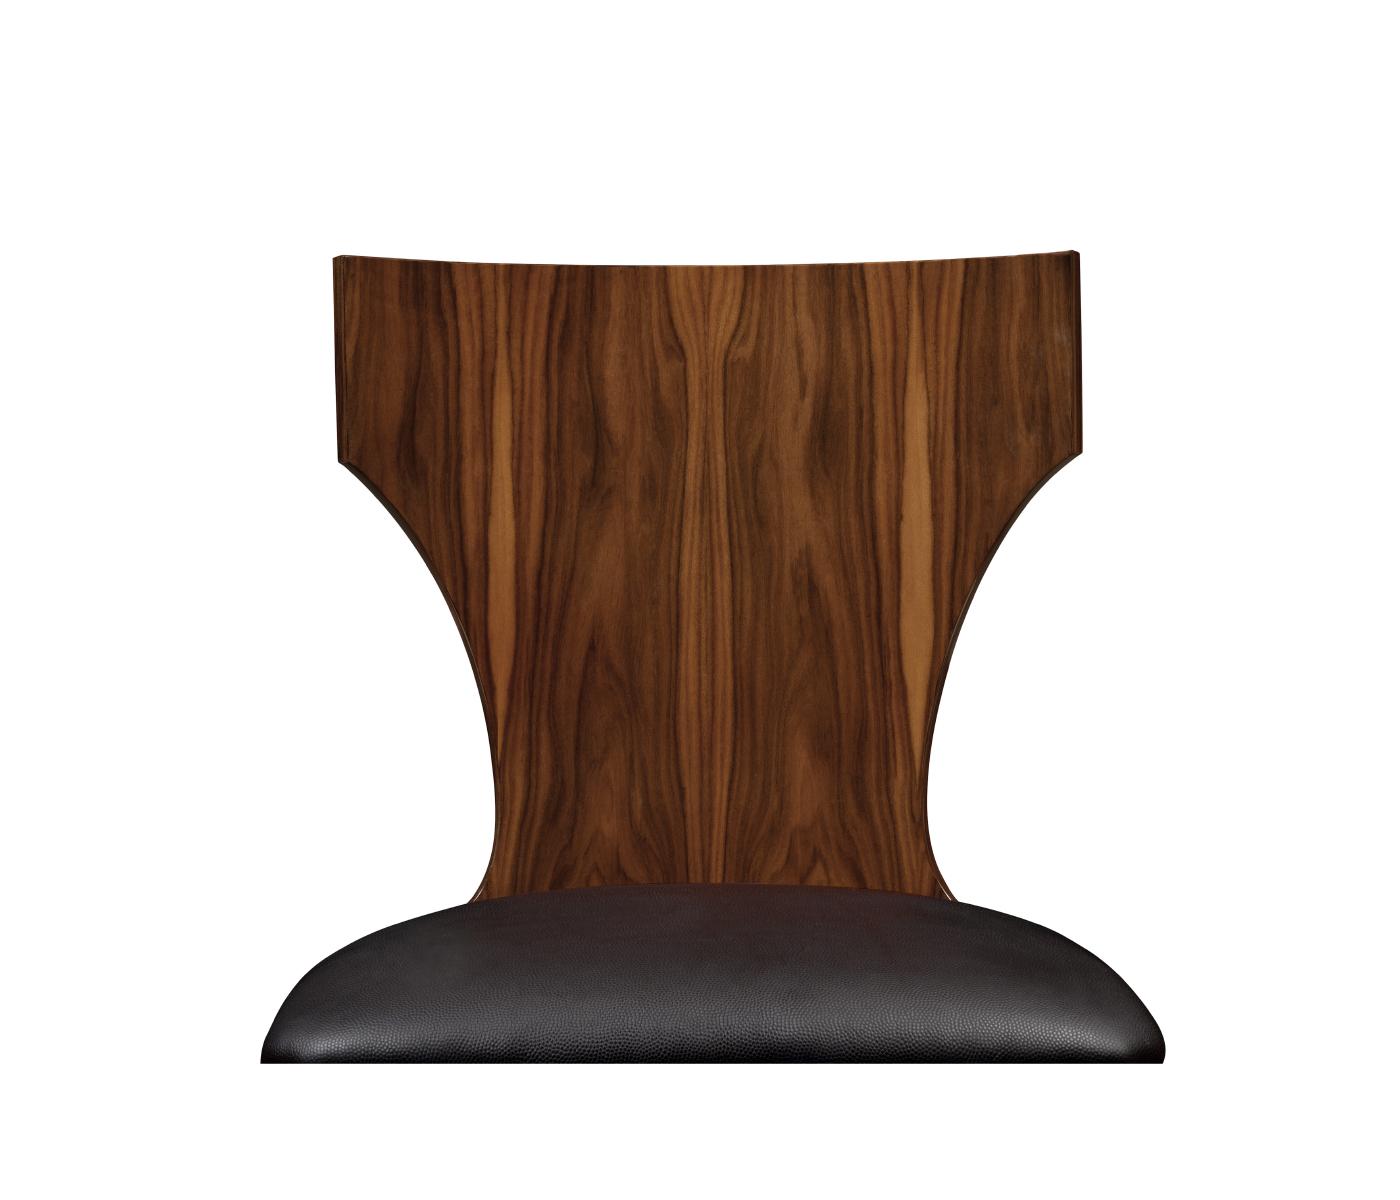 Admirable Art Deco Satin Klismos Chair In Brown Leather Unemploymentrelief Wooden Chair Designs For Living Room Unemploymentrelieforg